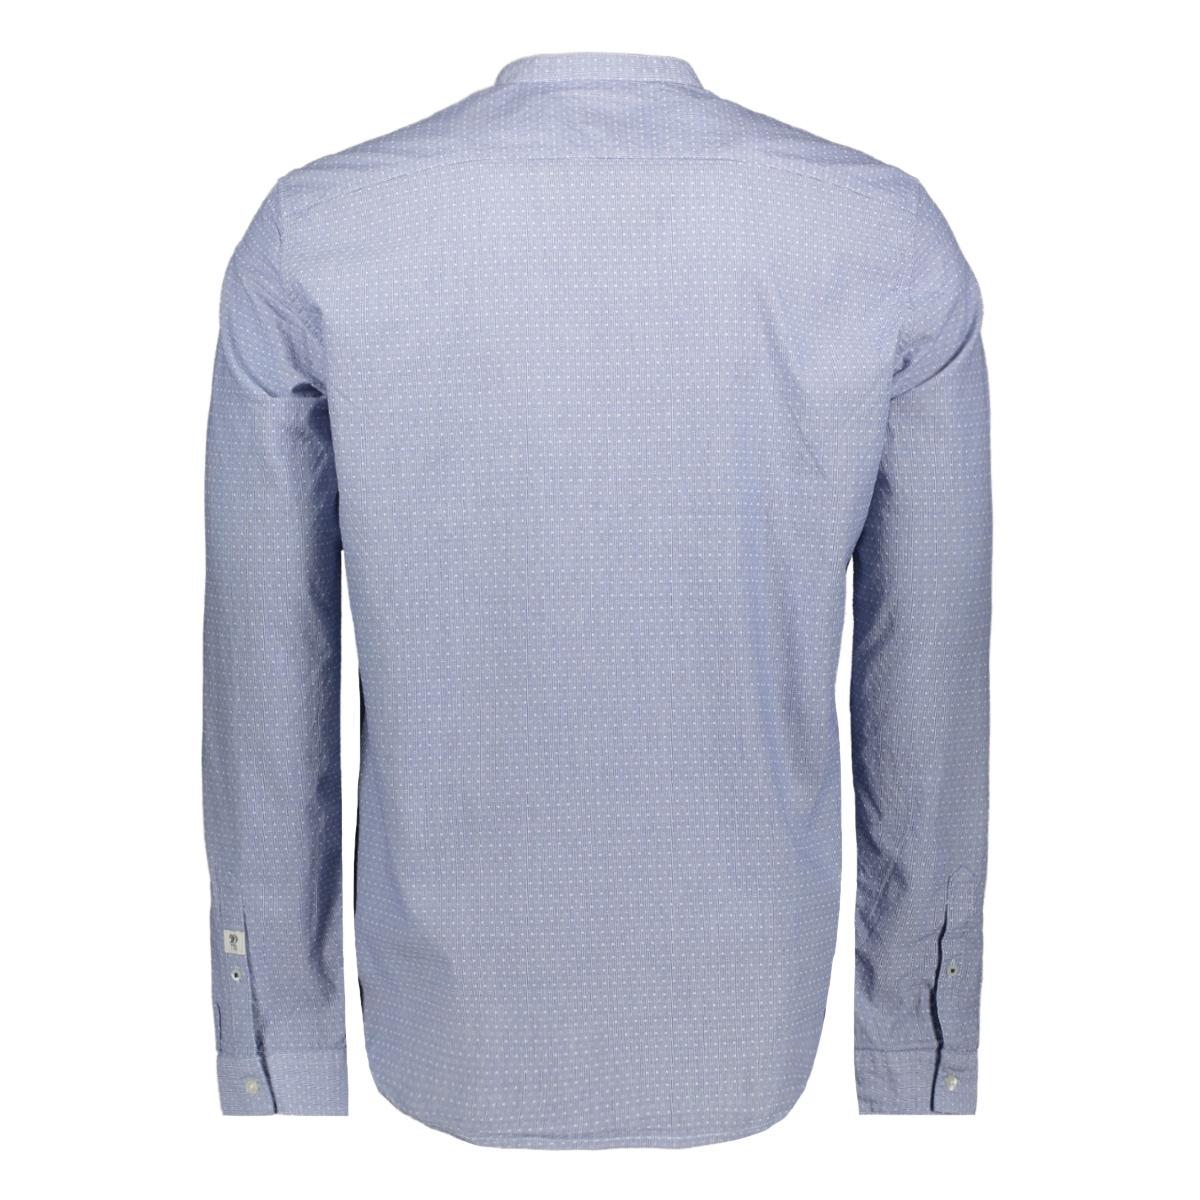 overhemd met lange mouwen 1017368xx12 tom tailor overhemd 22042